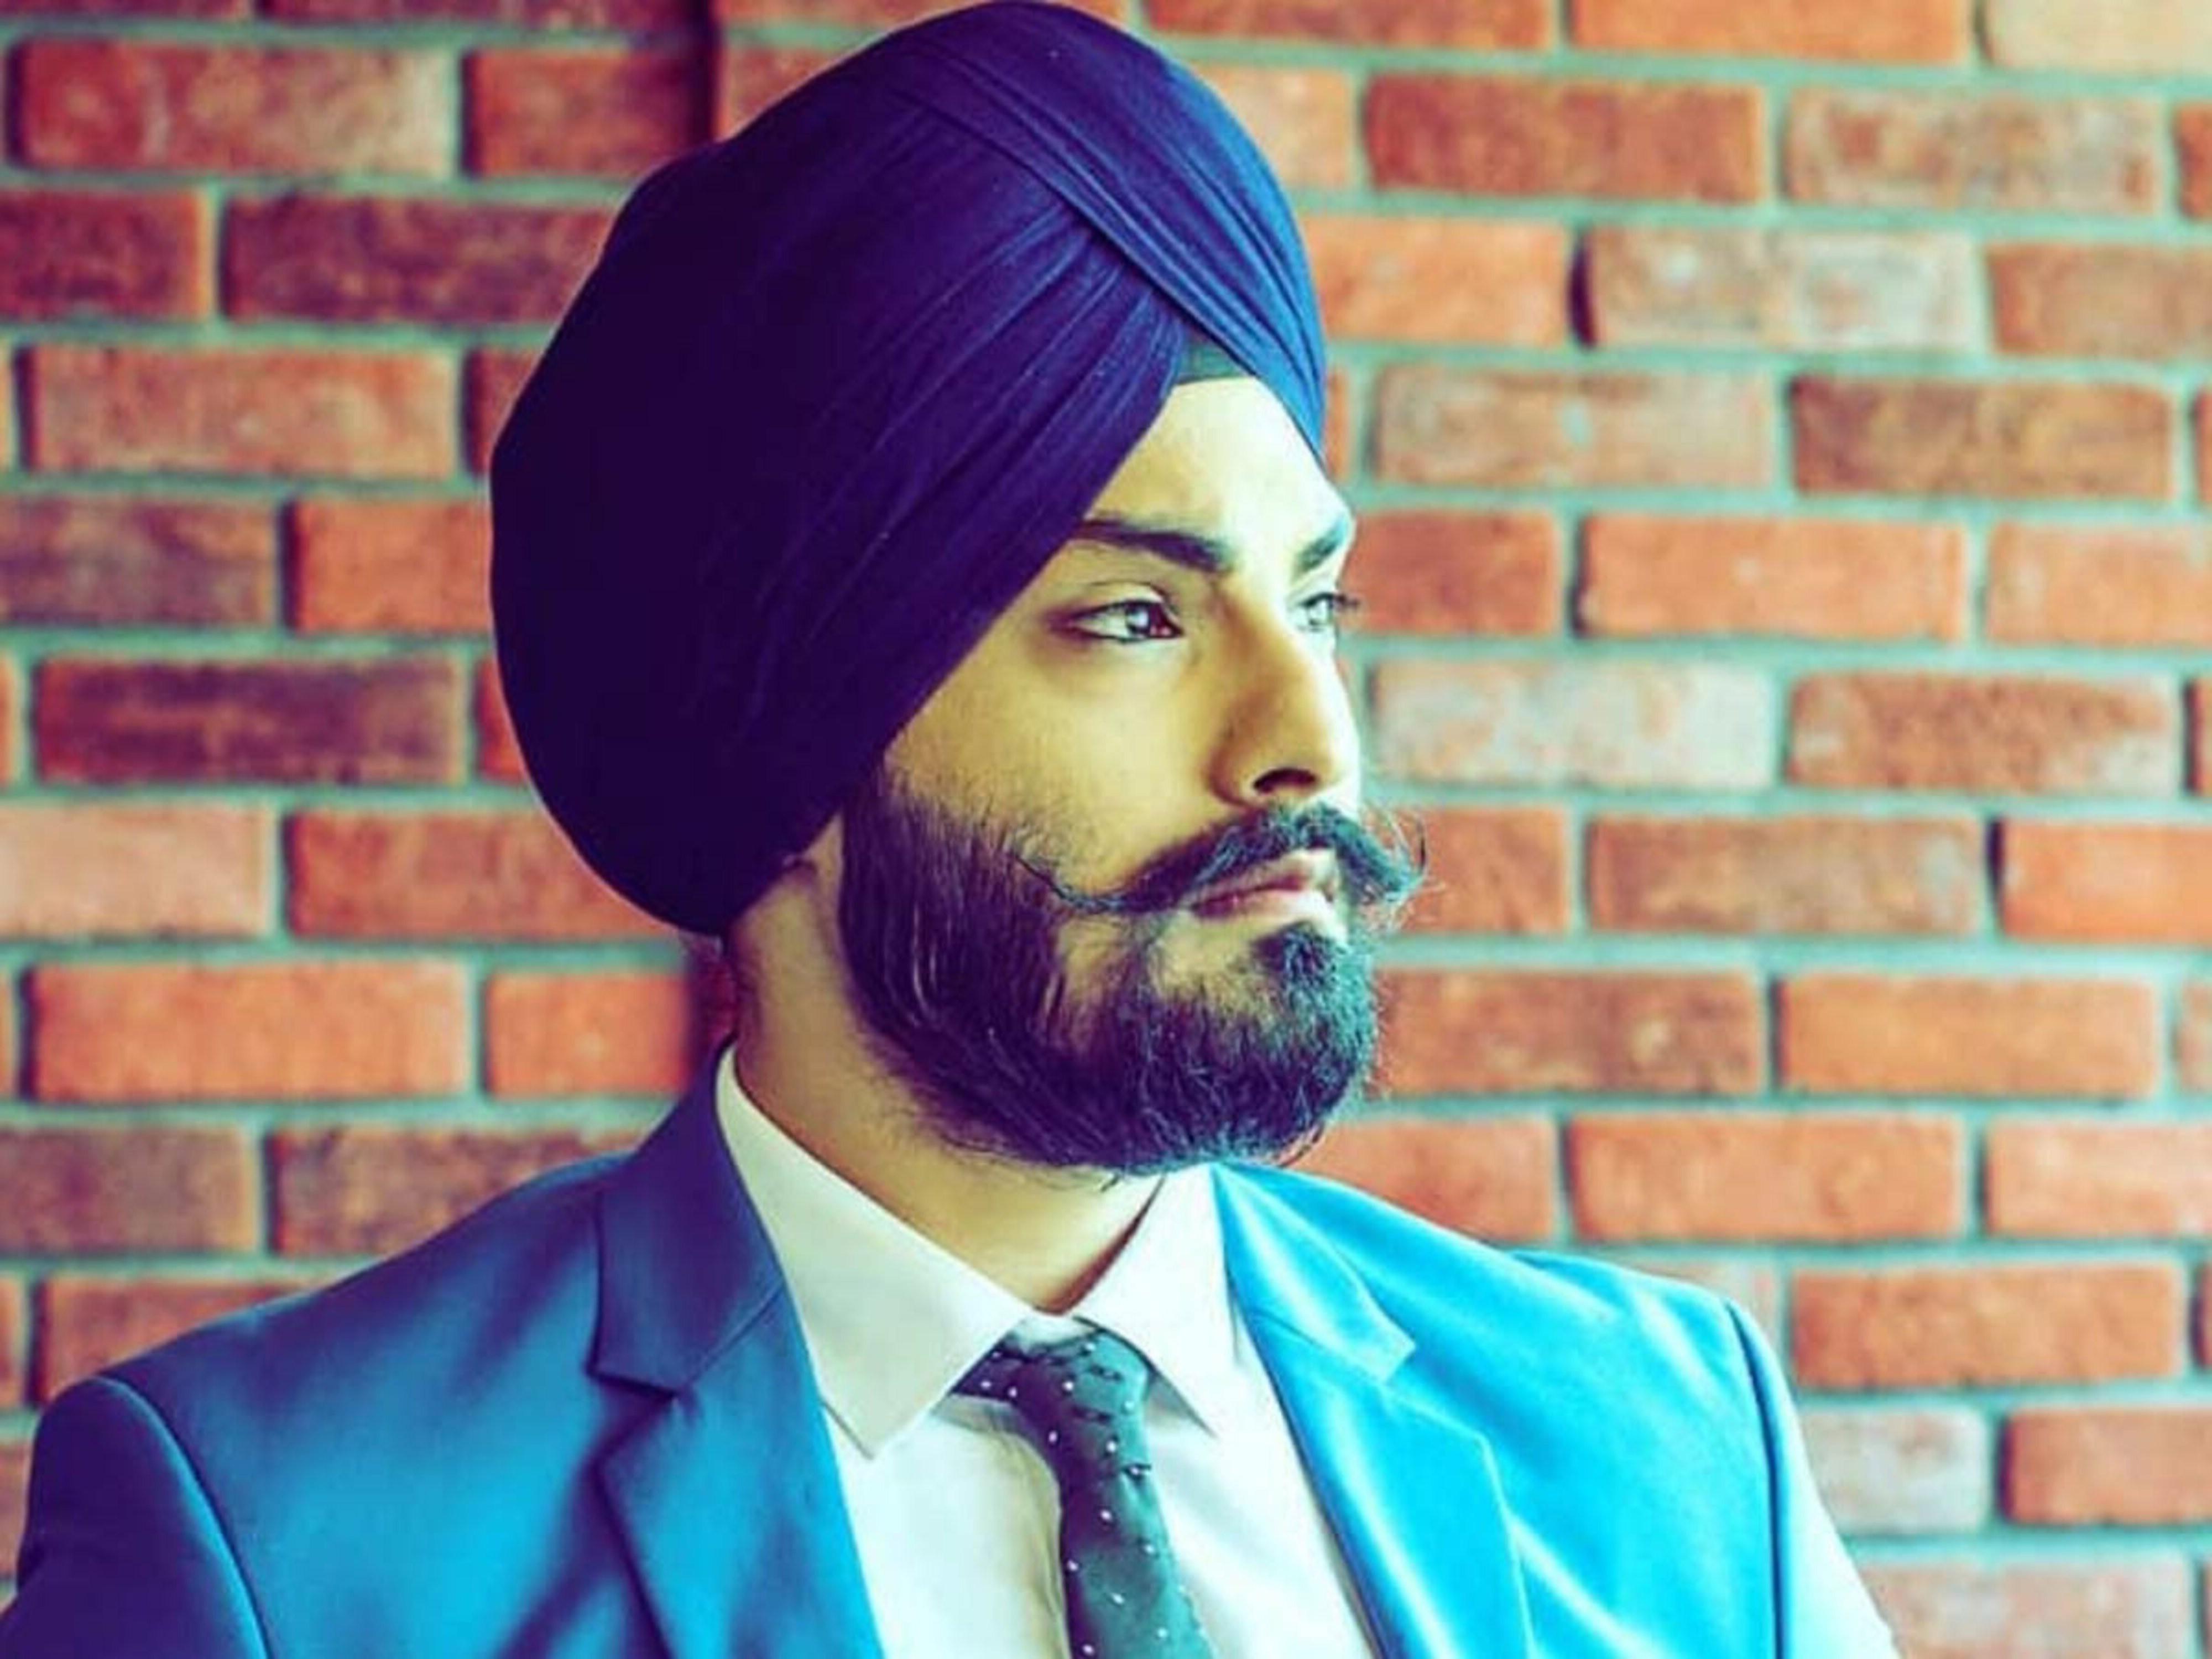 A long Sikh beard for stylish males.